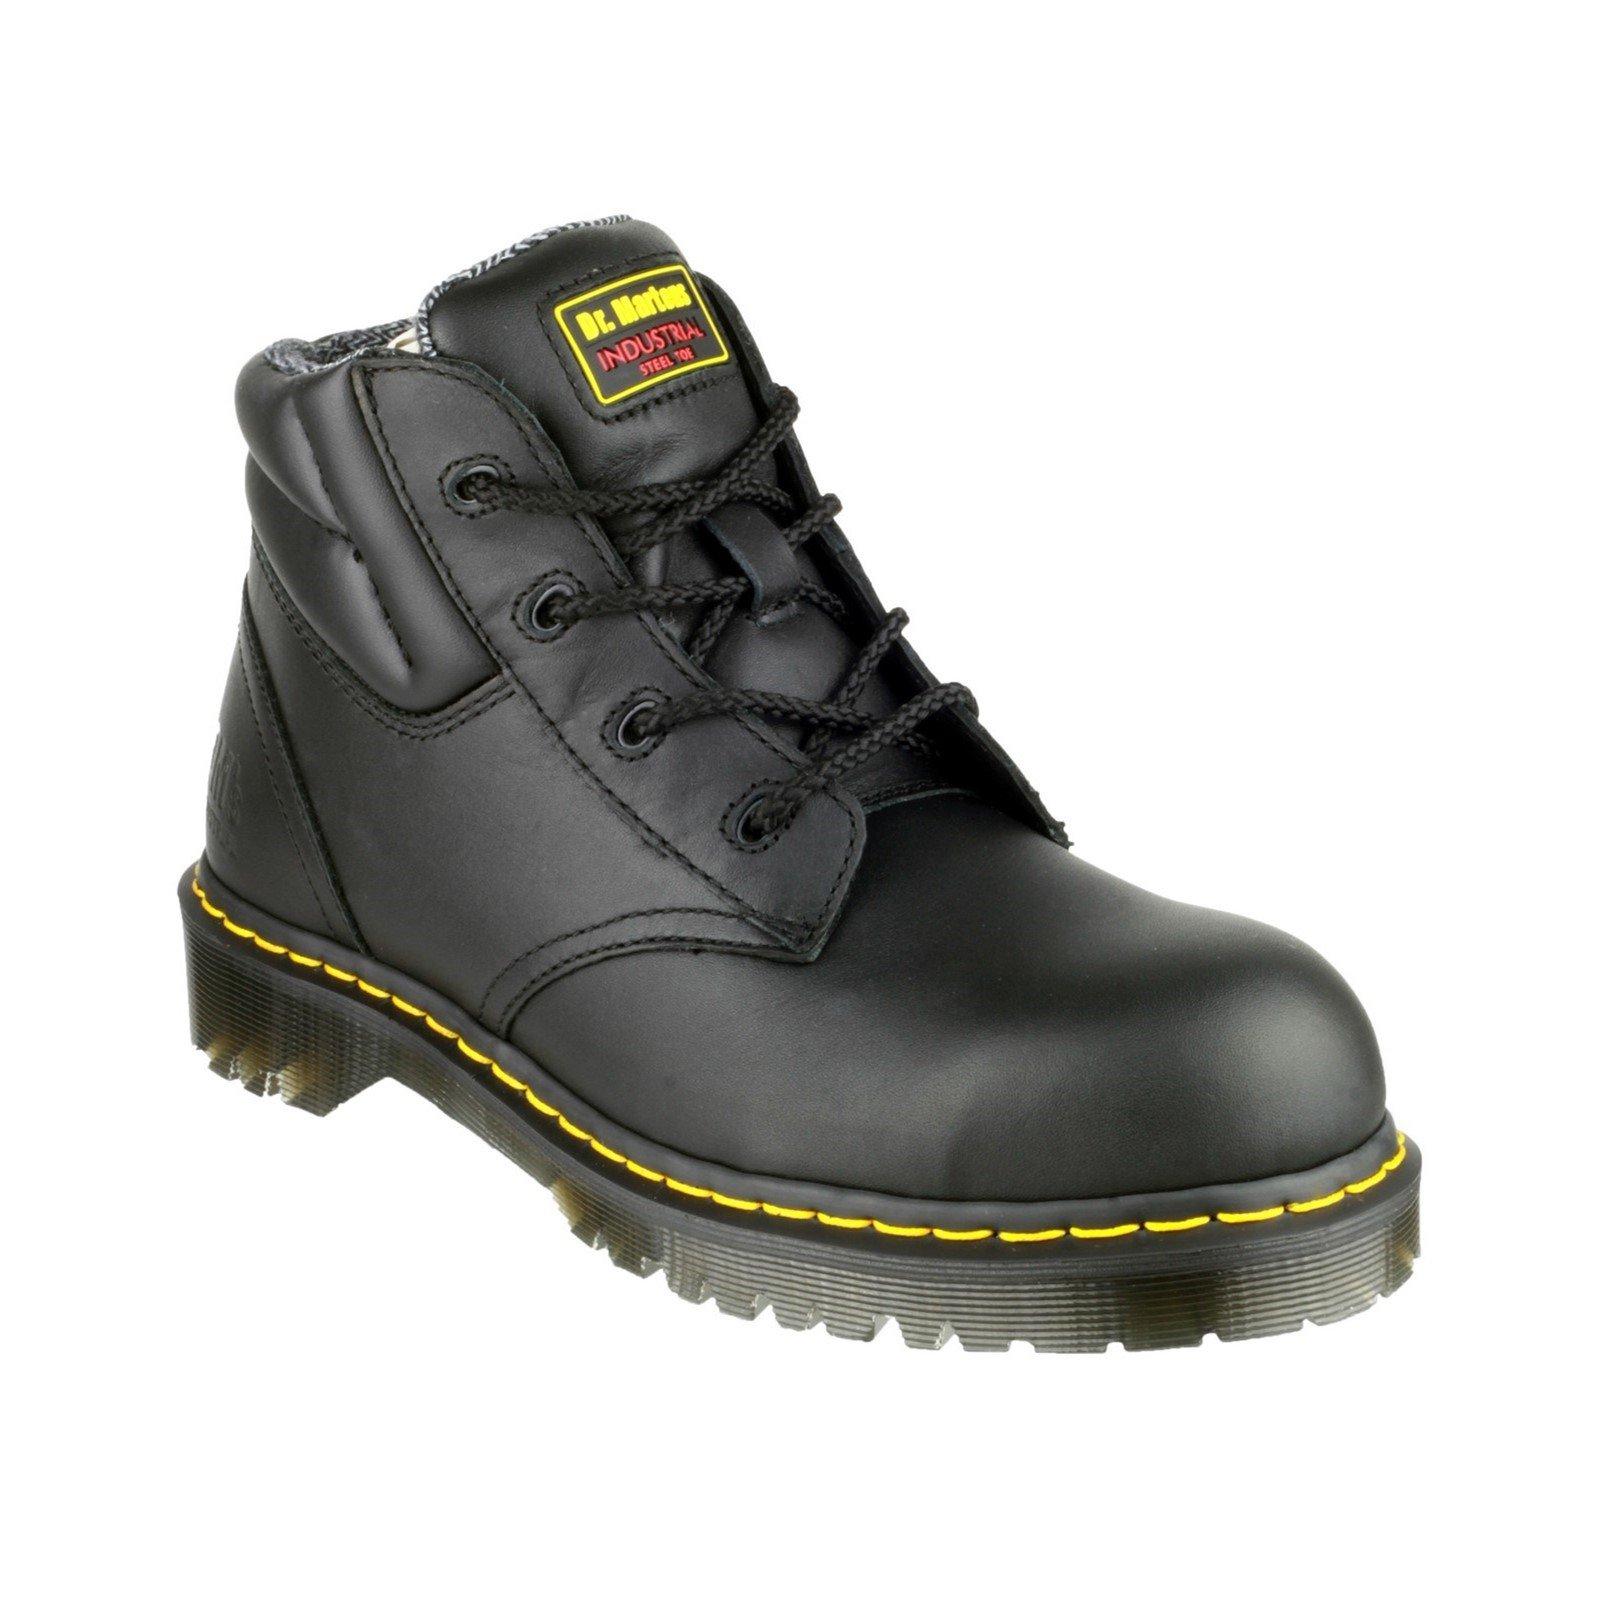 Dr Martens Unisex Lace-Up Boot Black 14068 - Black 9